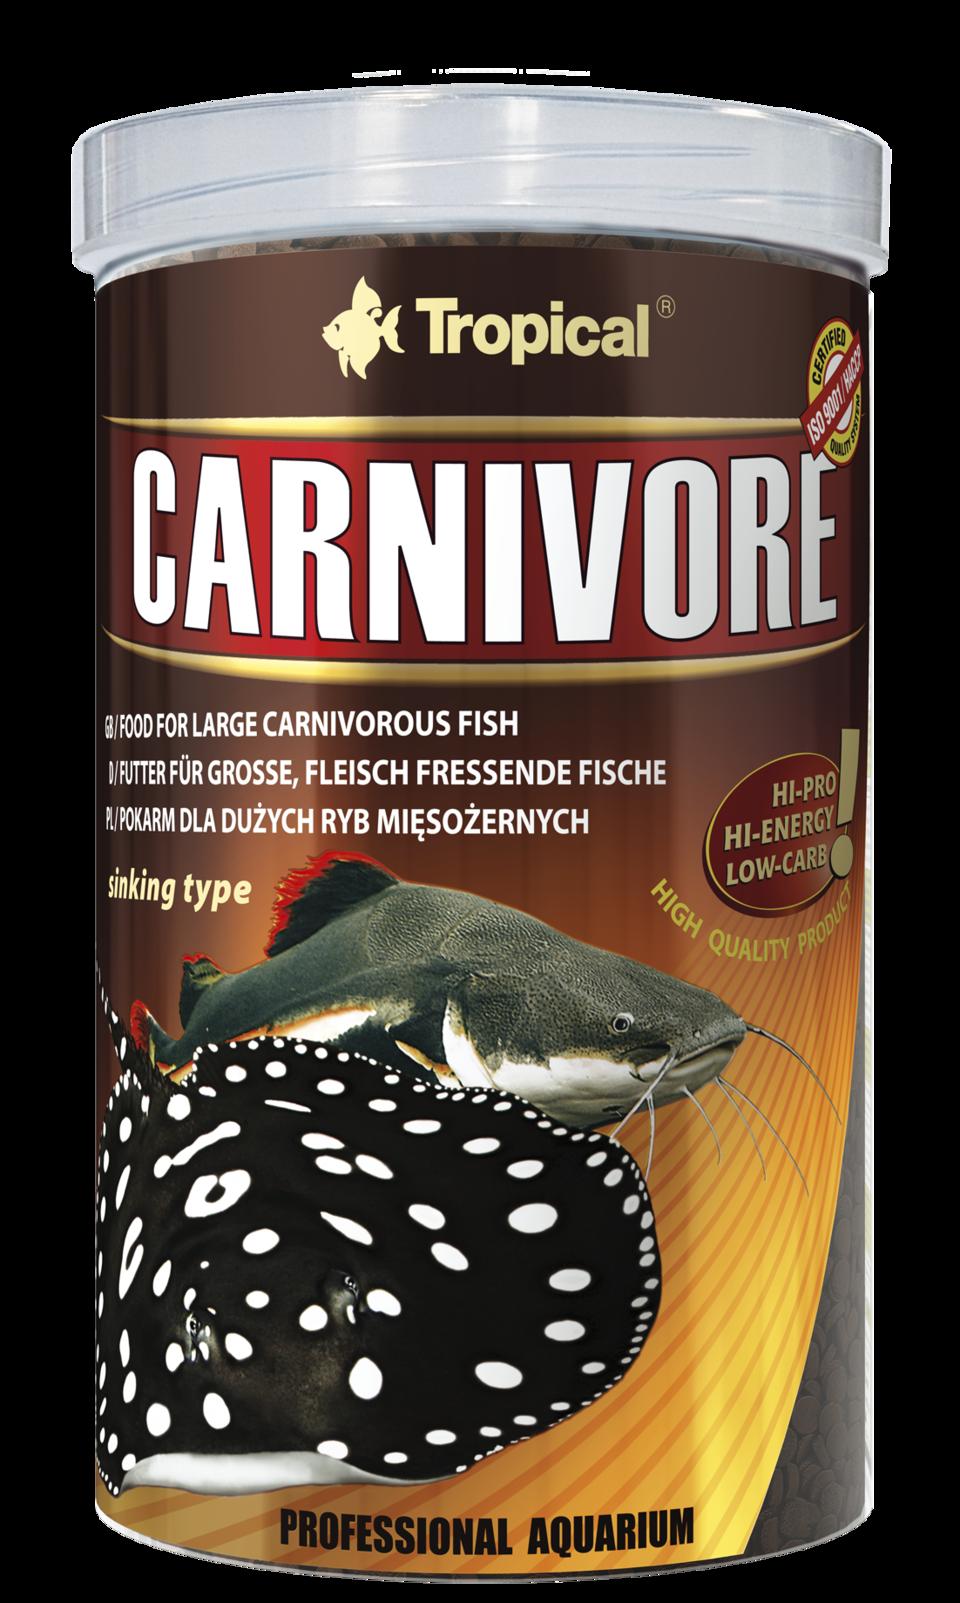 TROPICAL Carnivore 1L nourriture pour grands poissons carnivores